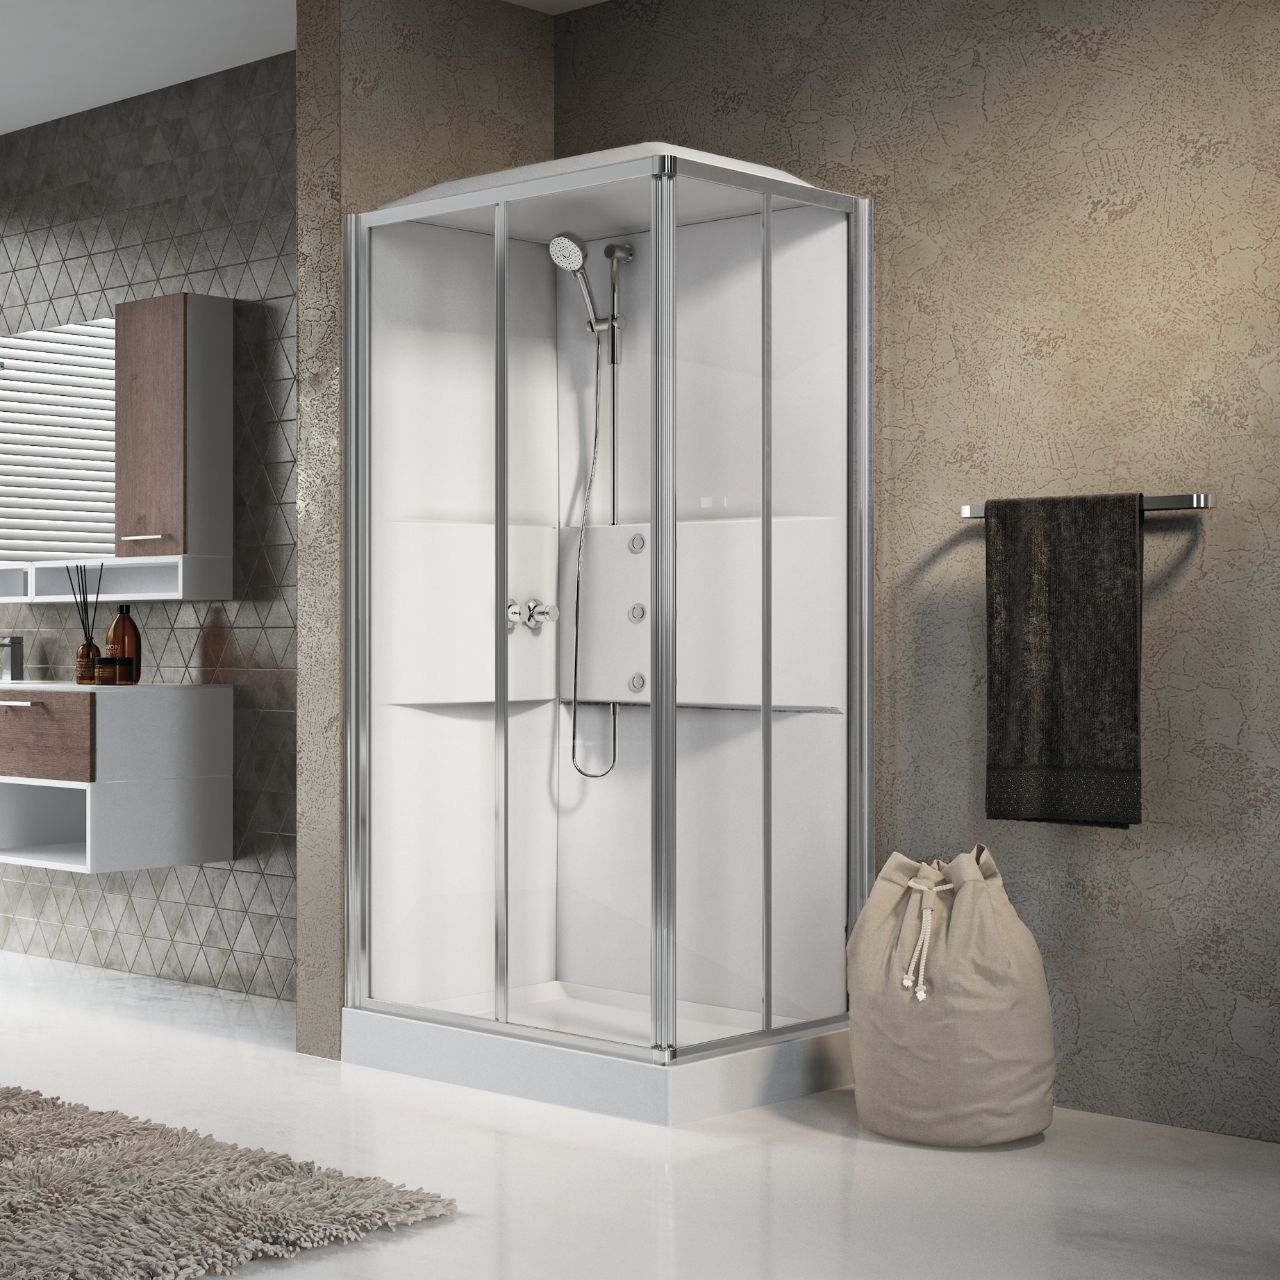 Cabine doccia media 2 0 a100x80 novellini - Cabine doccia multifunzione novellini ...